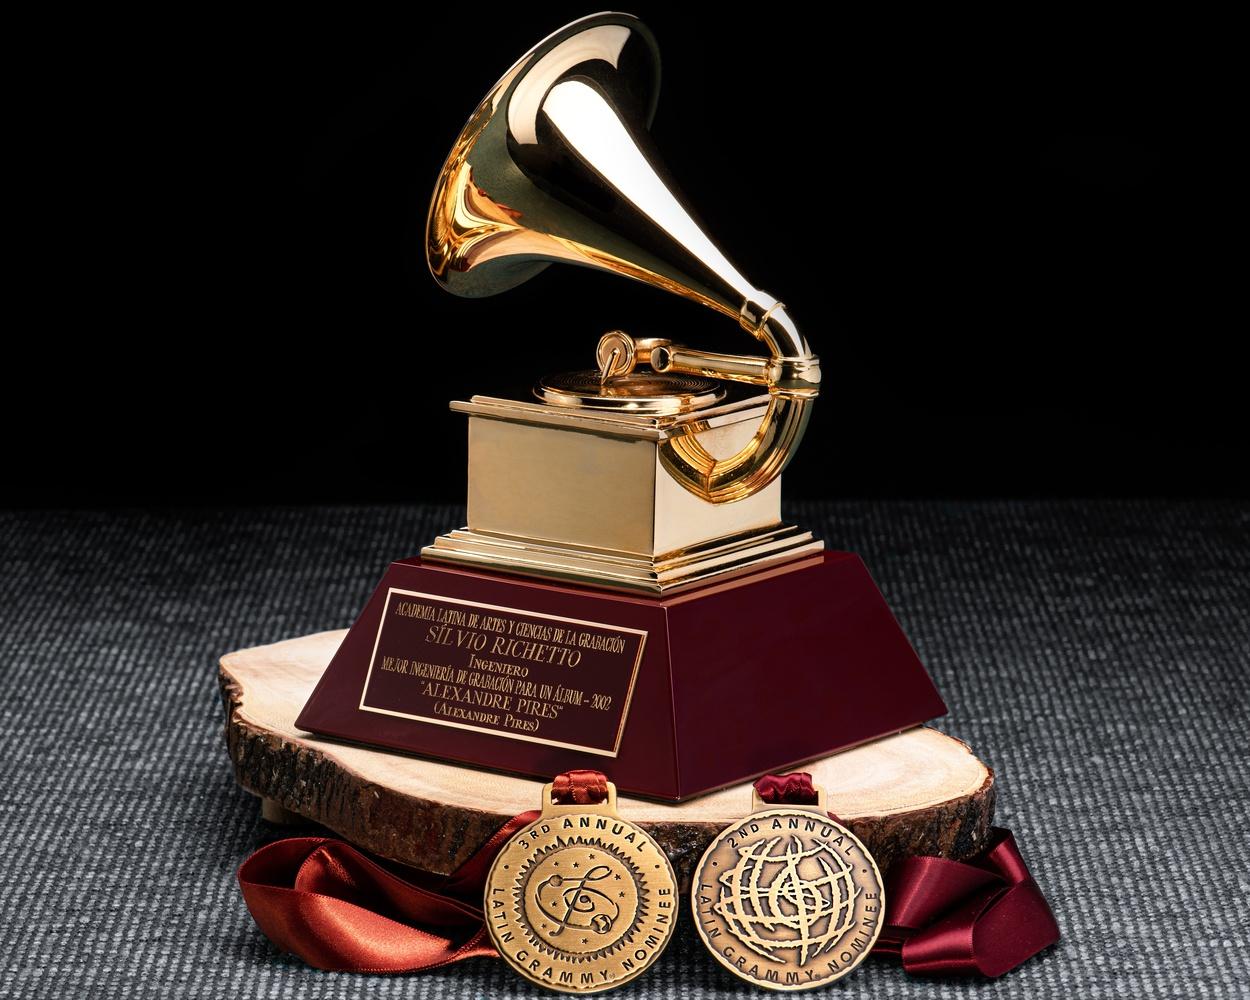 My Grammy Awards by Silvio Richetto